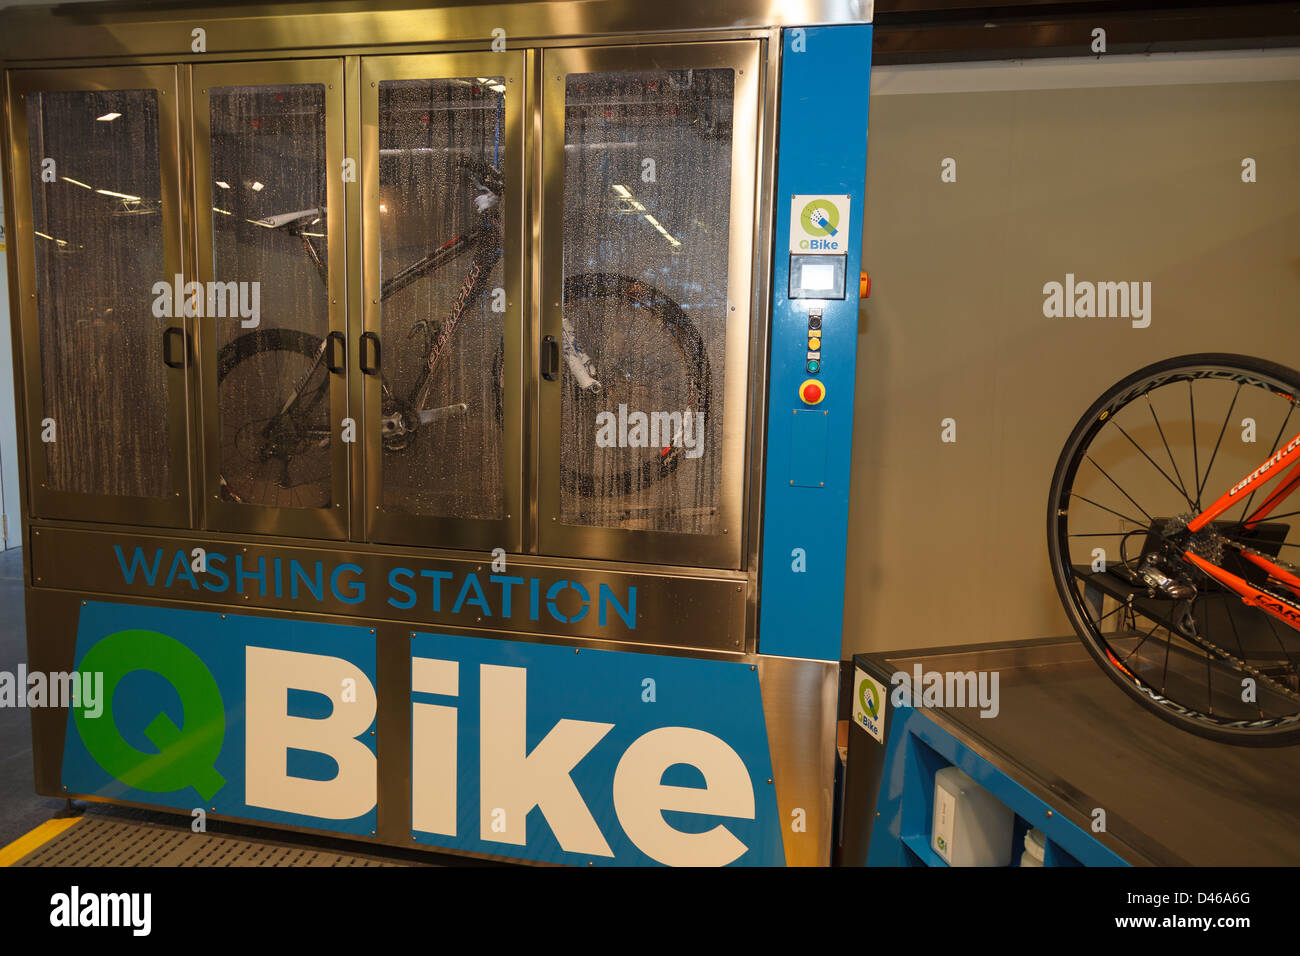 Bike washing station at Florence bike festival 2013 - Stock Image